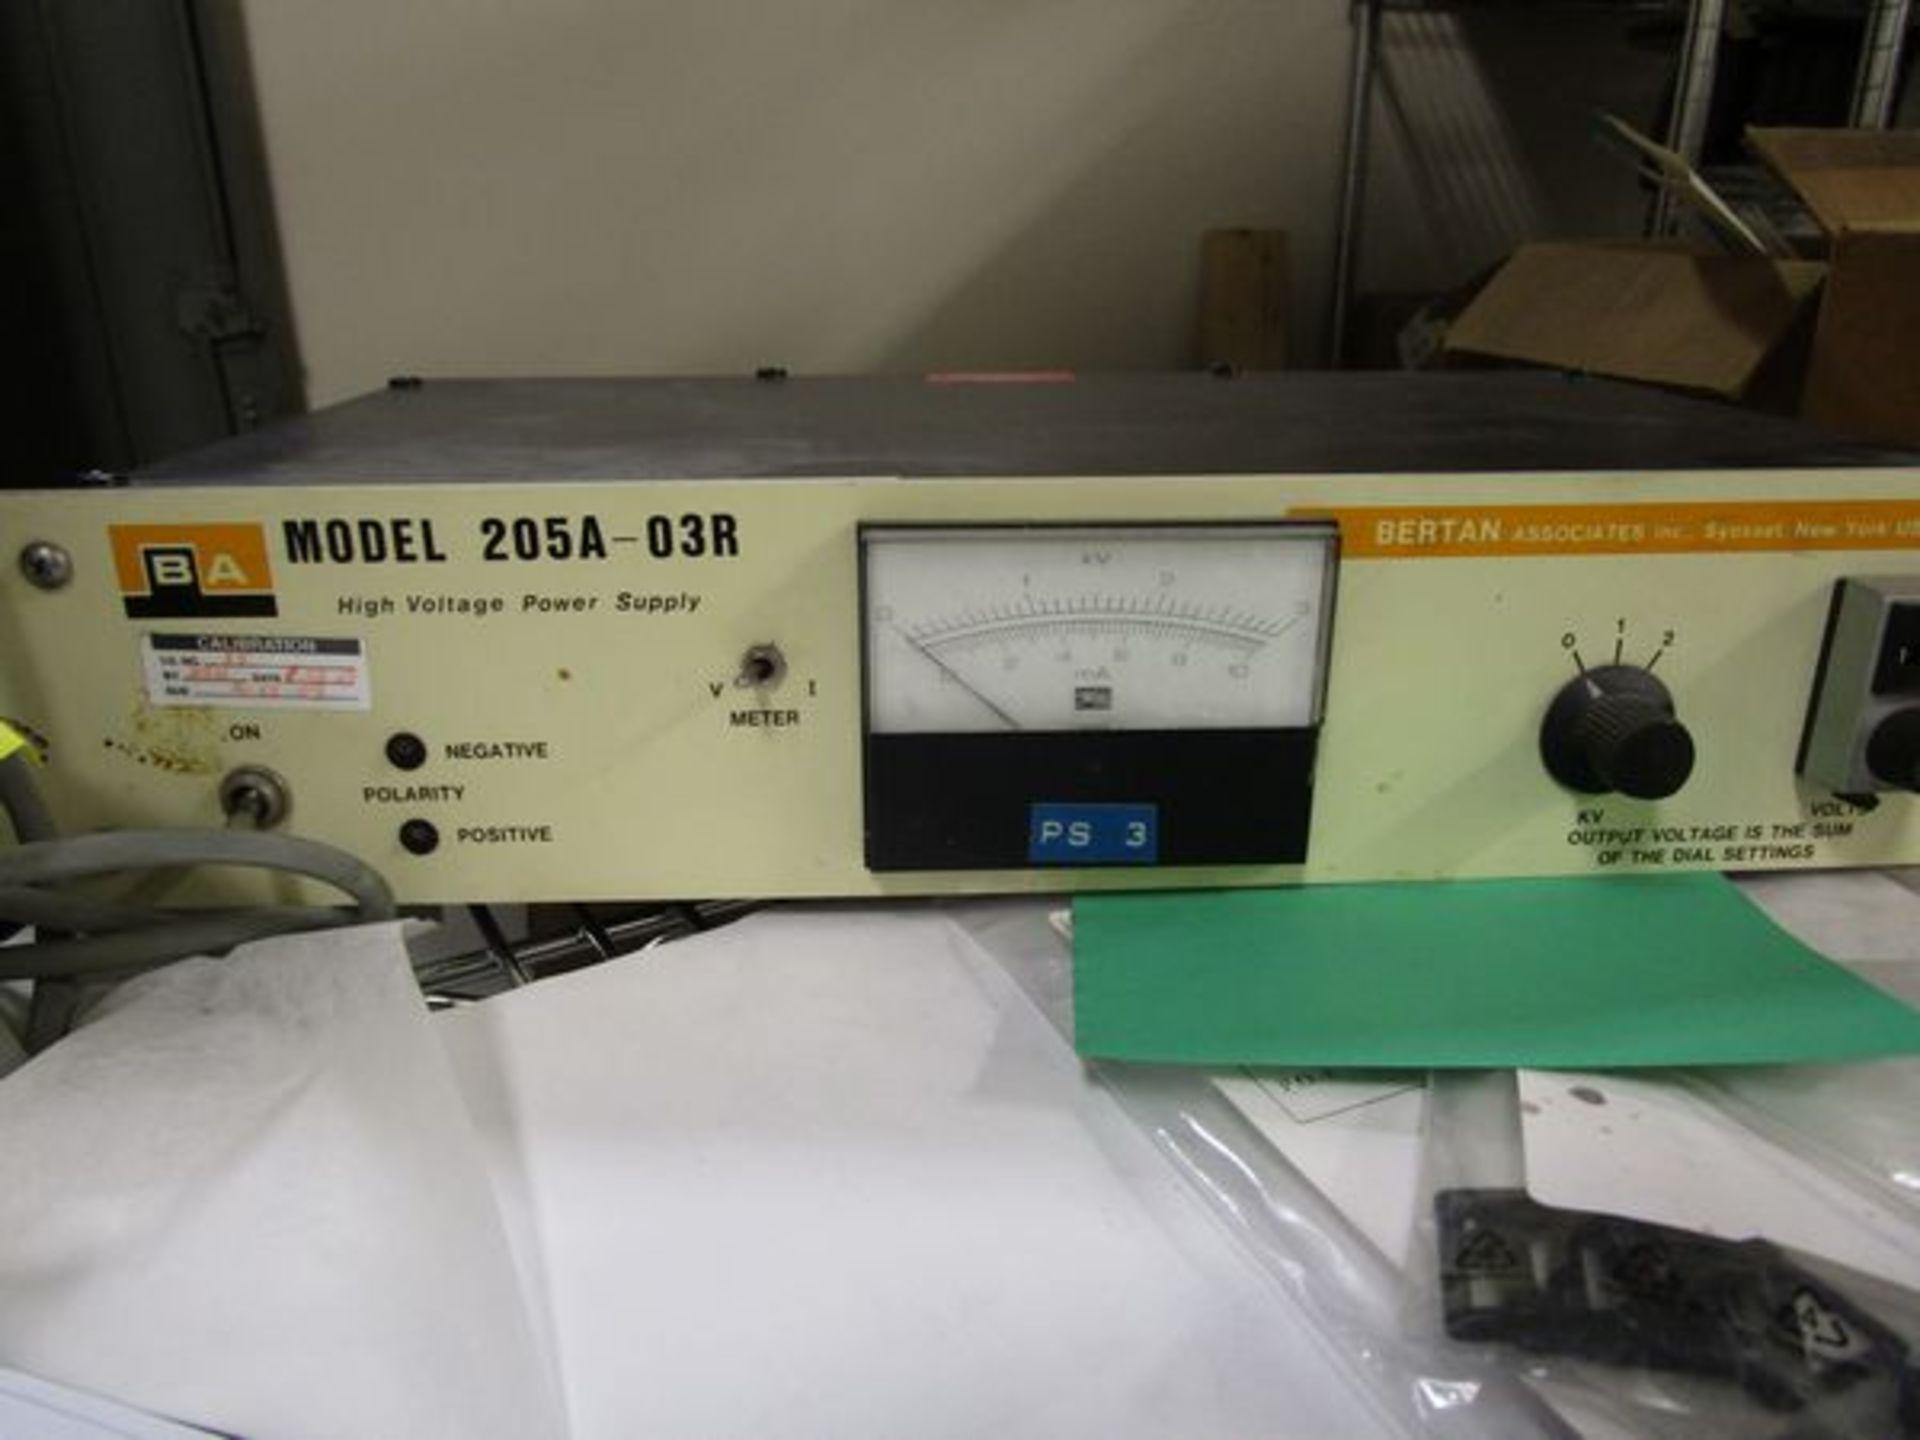 Bertan 205A-03R High Voltage Power Supply